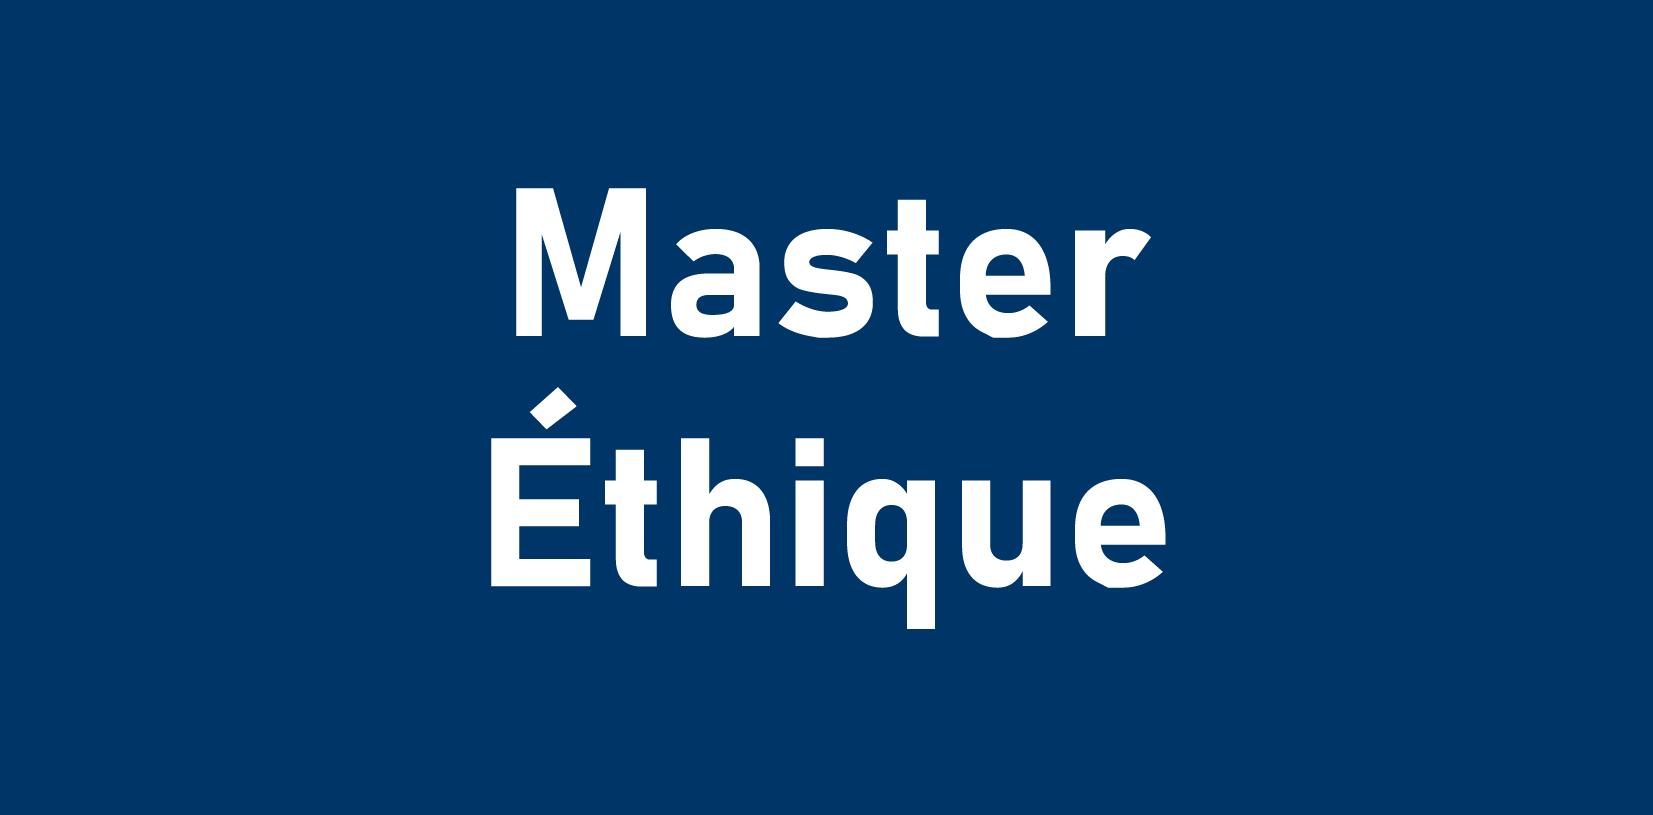 Master Ethique